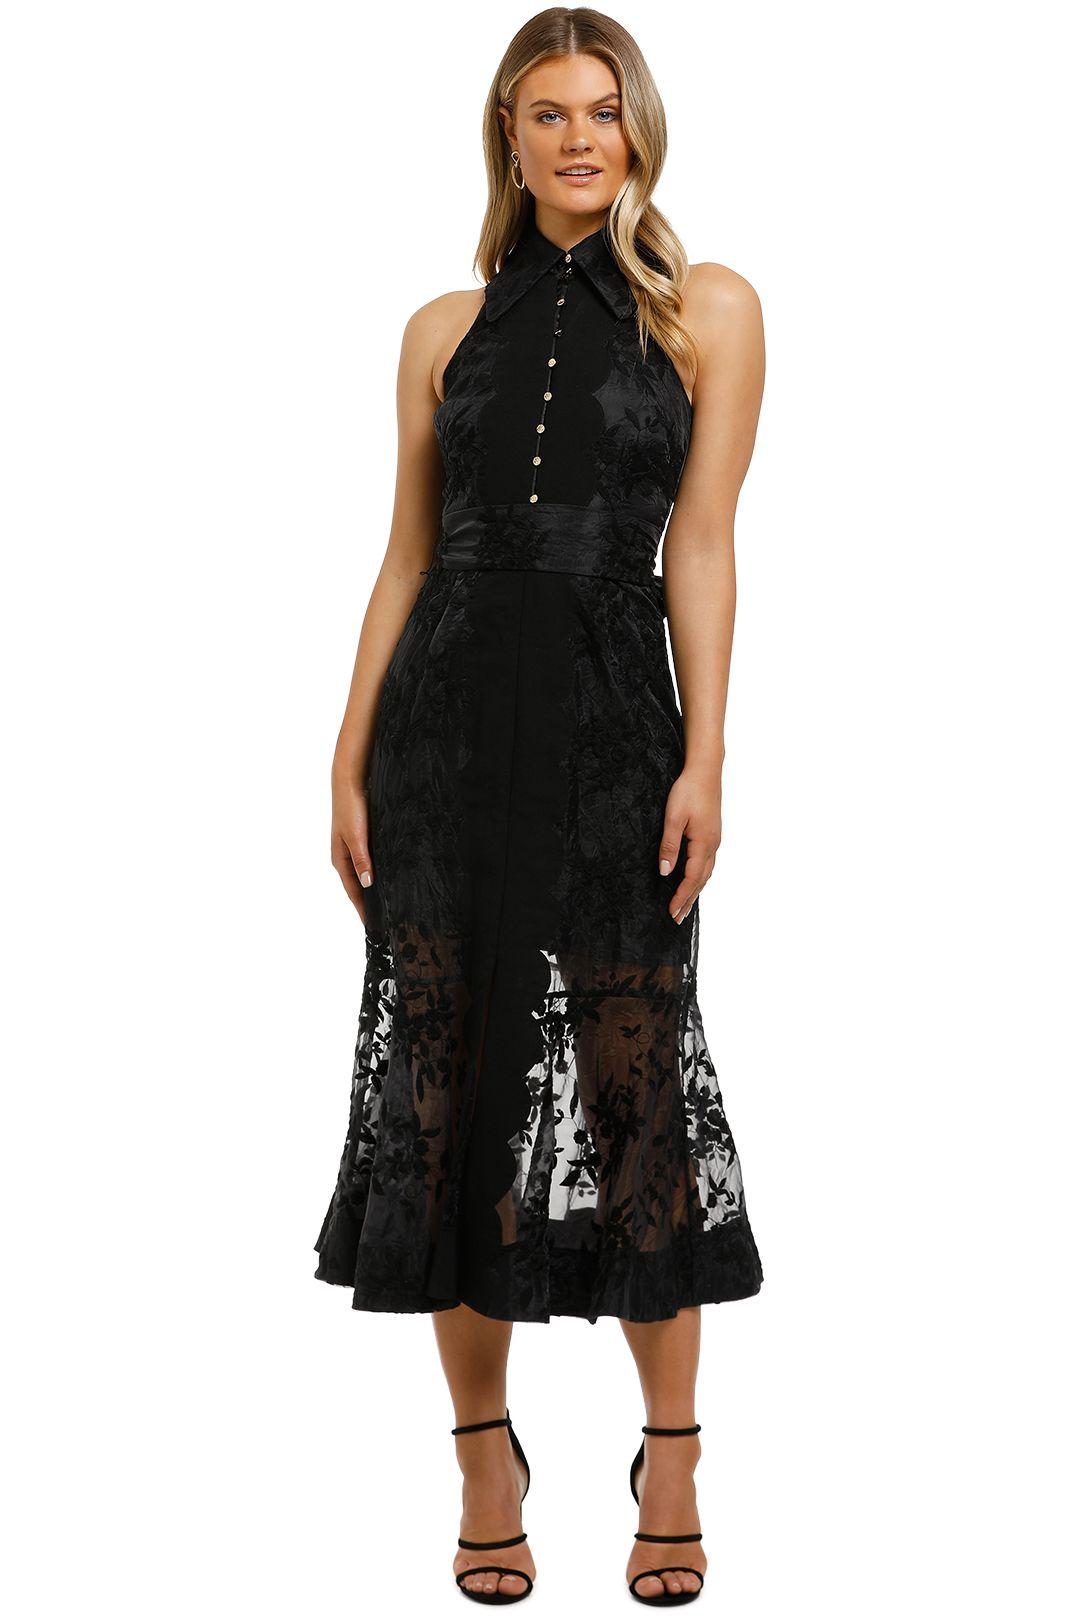 keepsake-the-label-vision-midi-dress-black-front